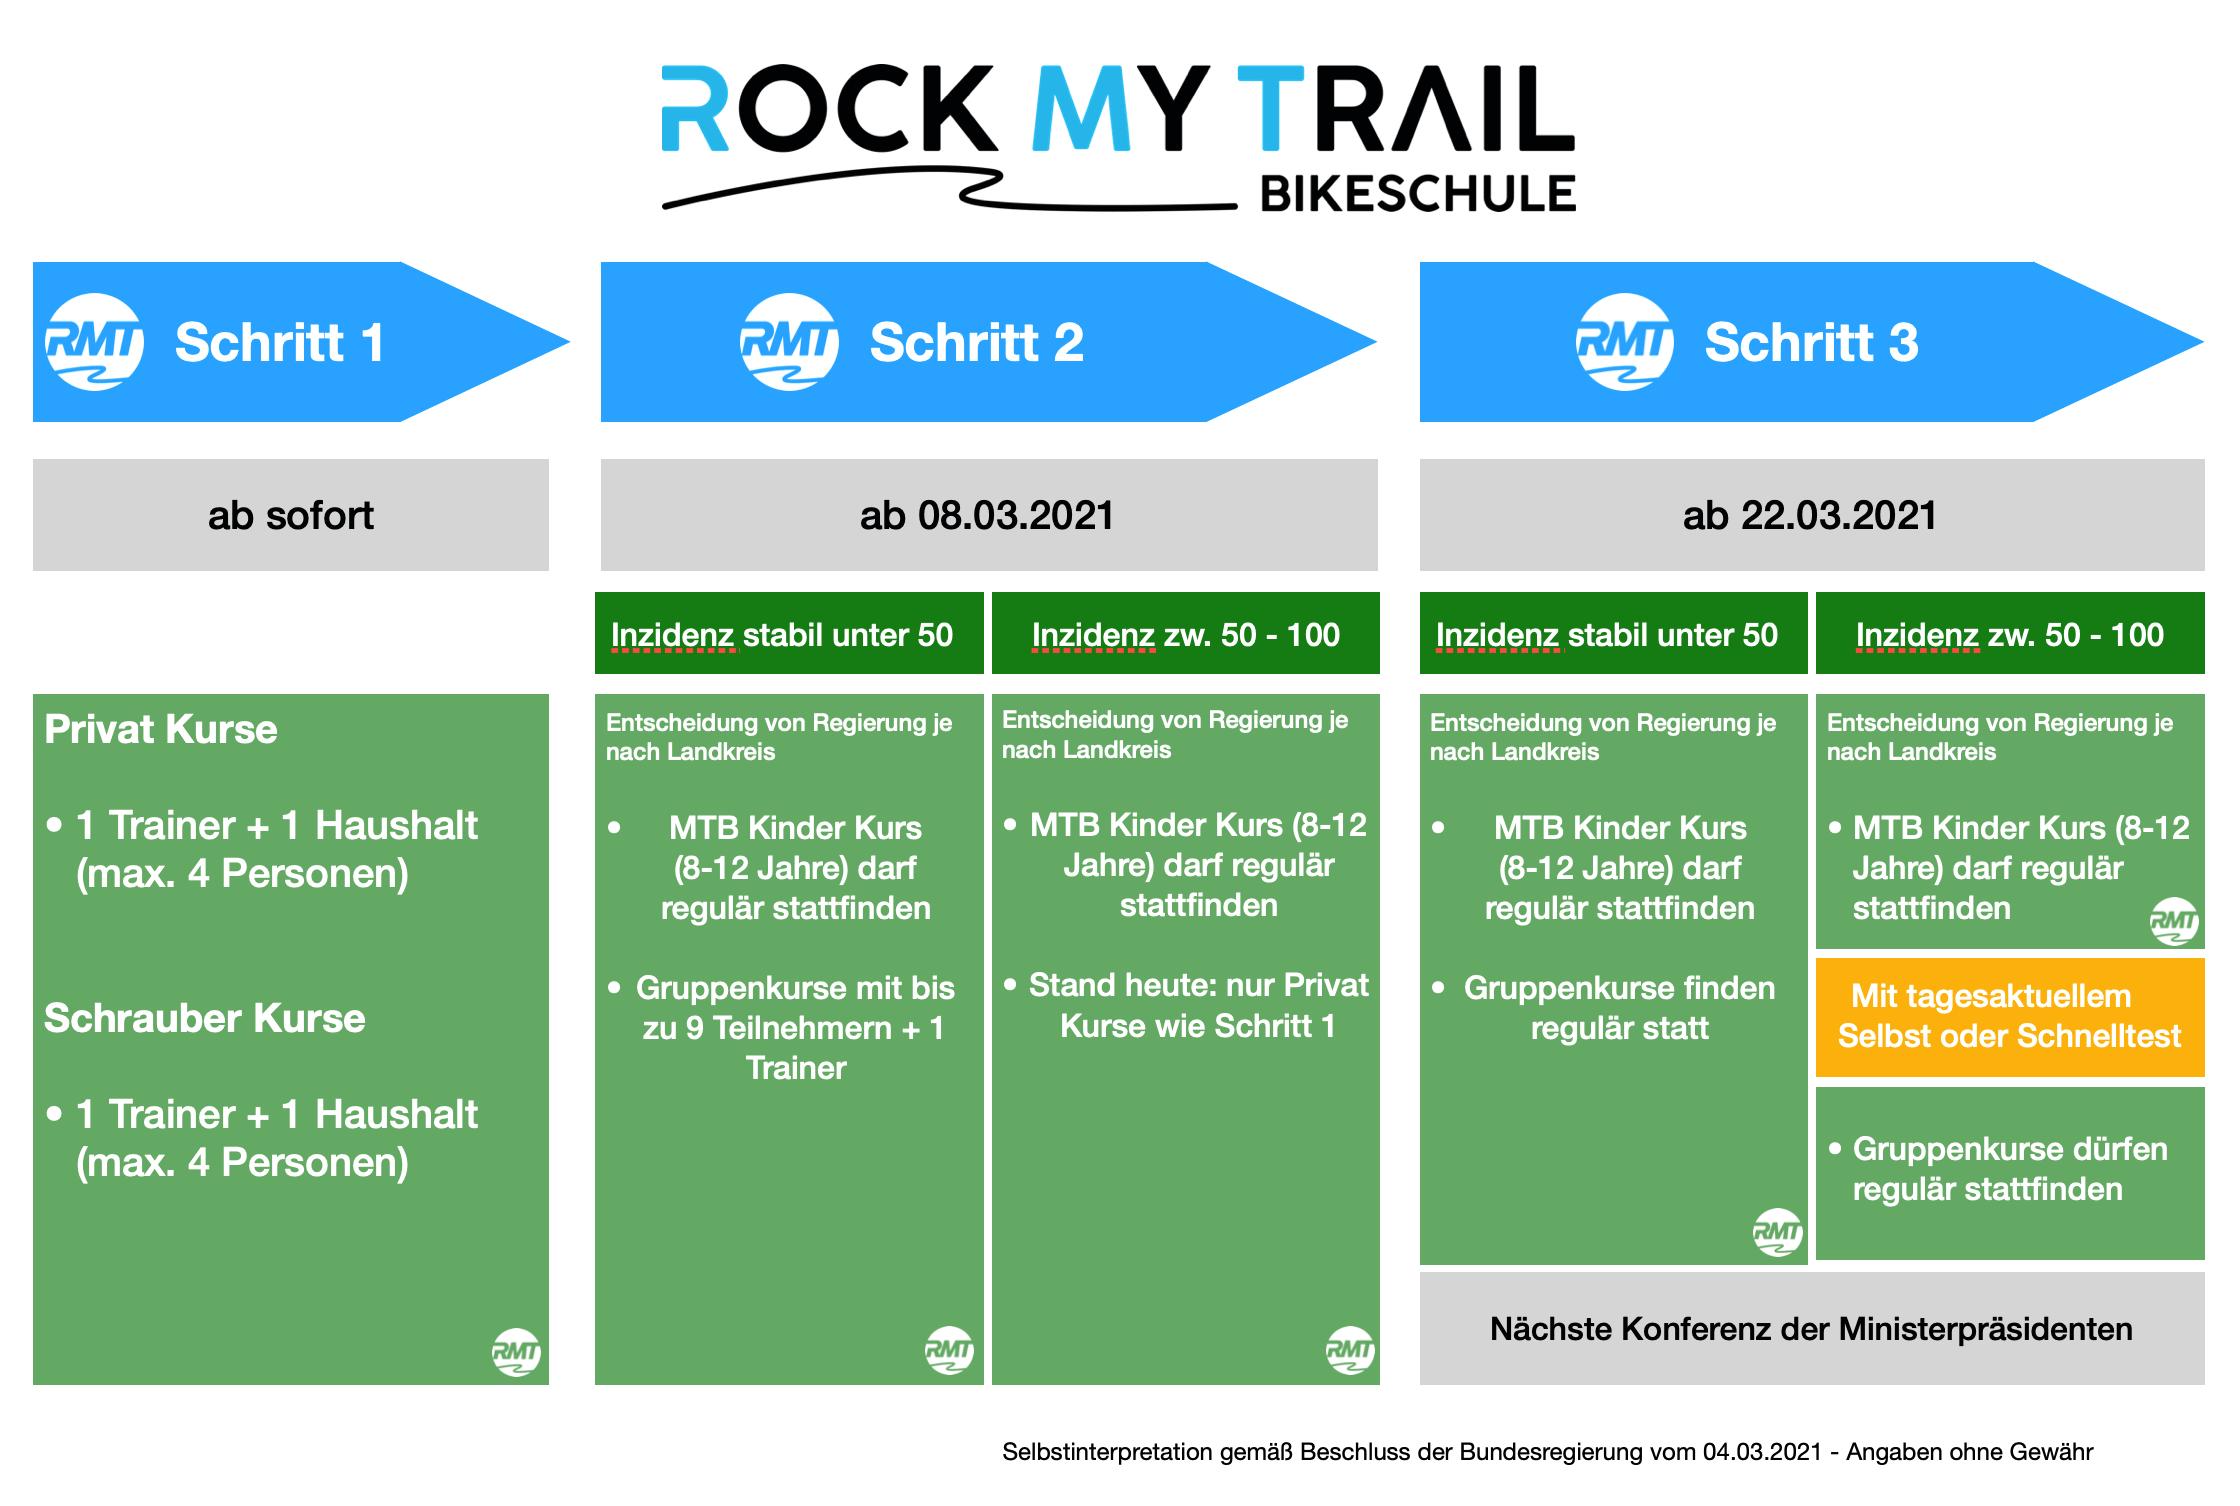 Corona Beschluesse Massnahmen Rock my Trail Bikeschule - Rock my Trail Bikeschule